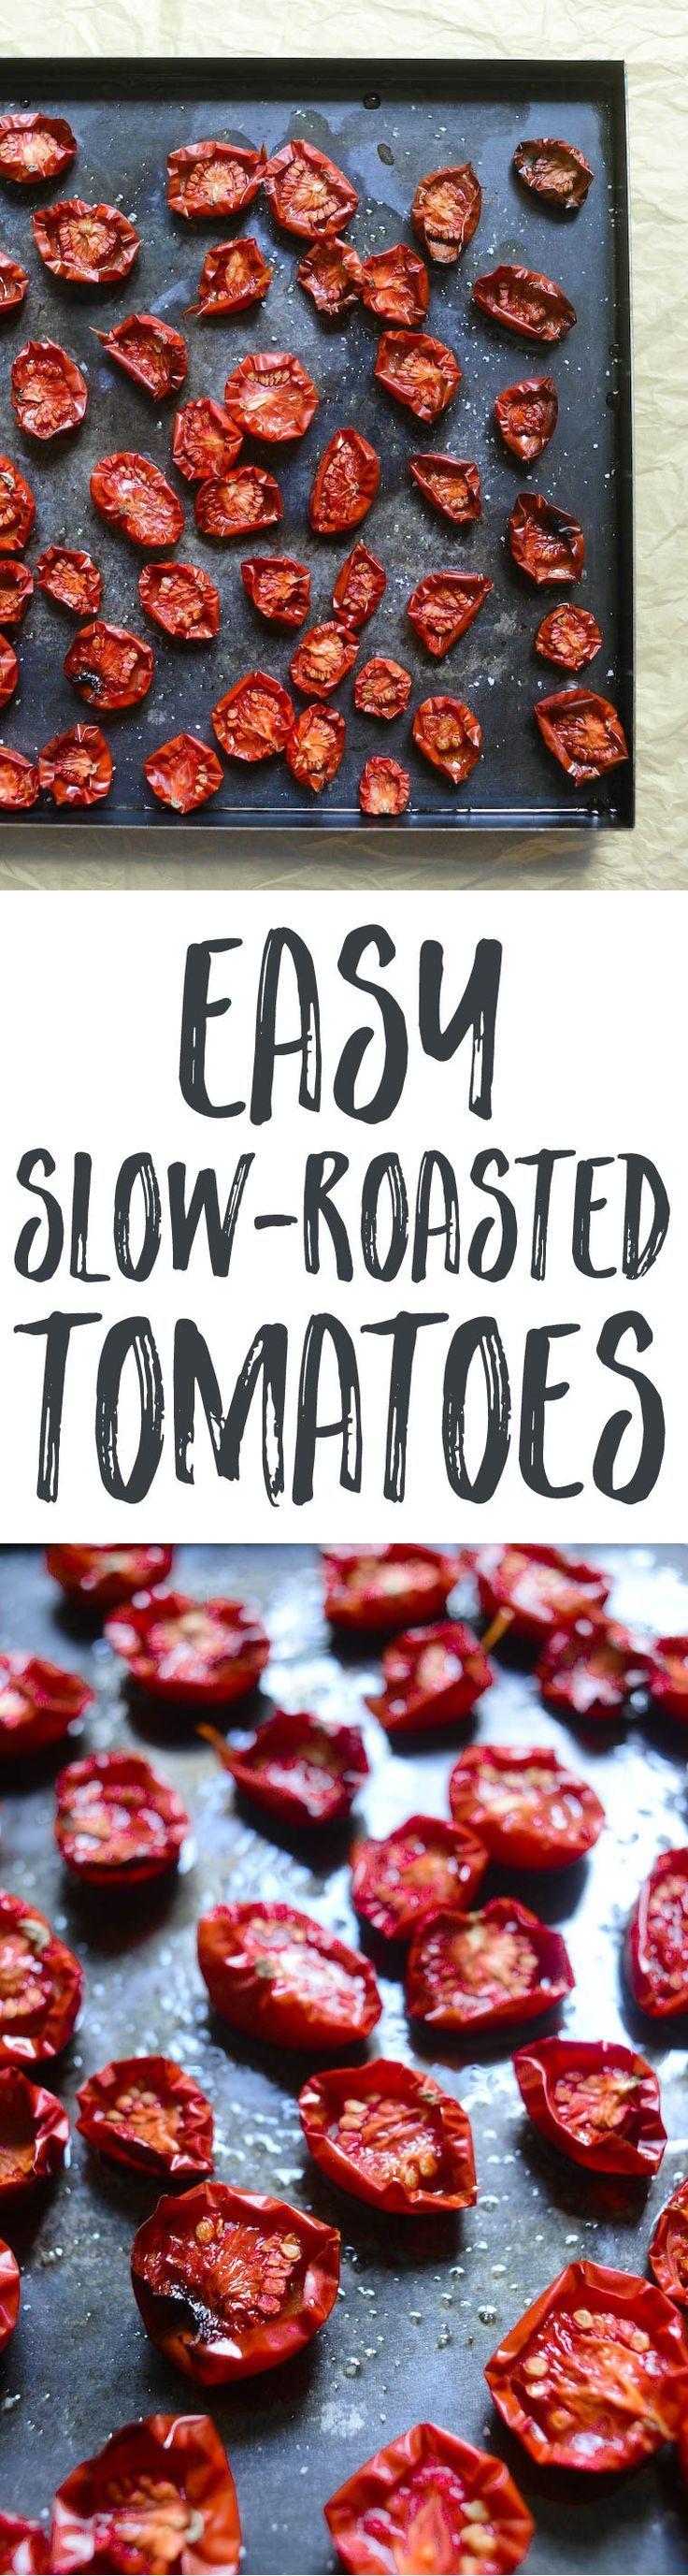 256 best Tips & Tricks for Recipes images on Pinterest